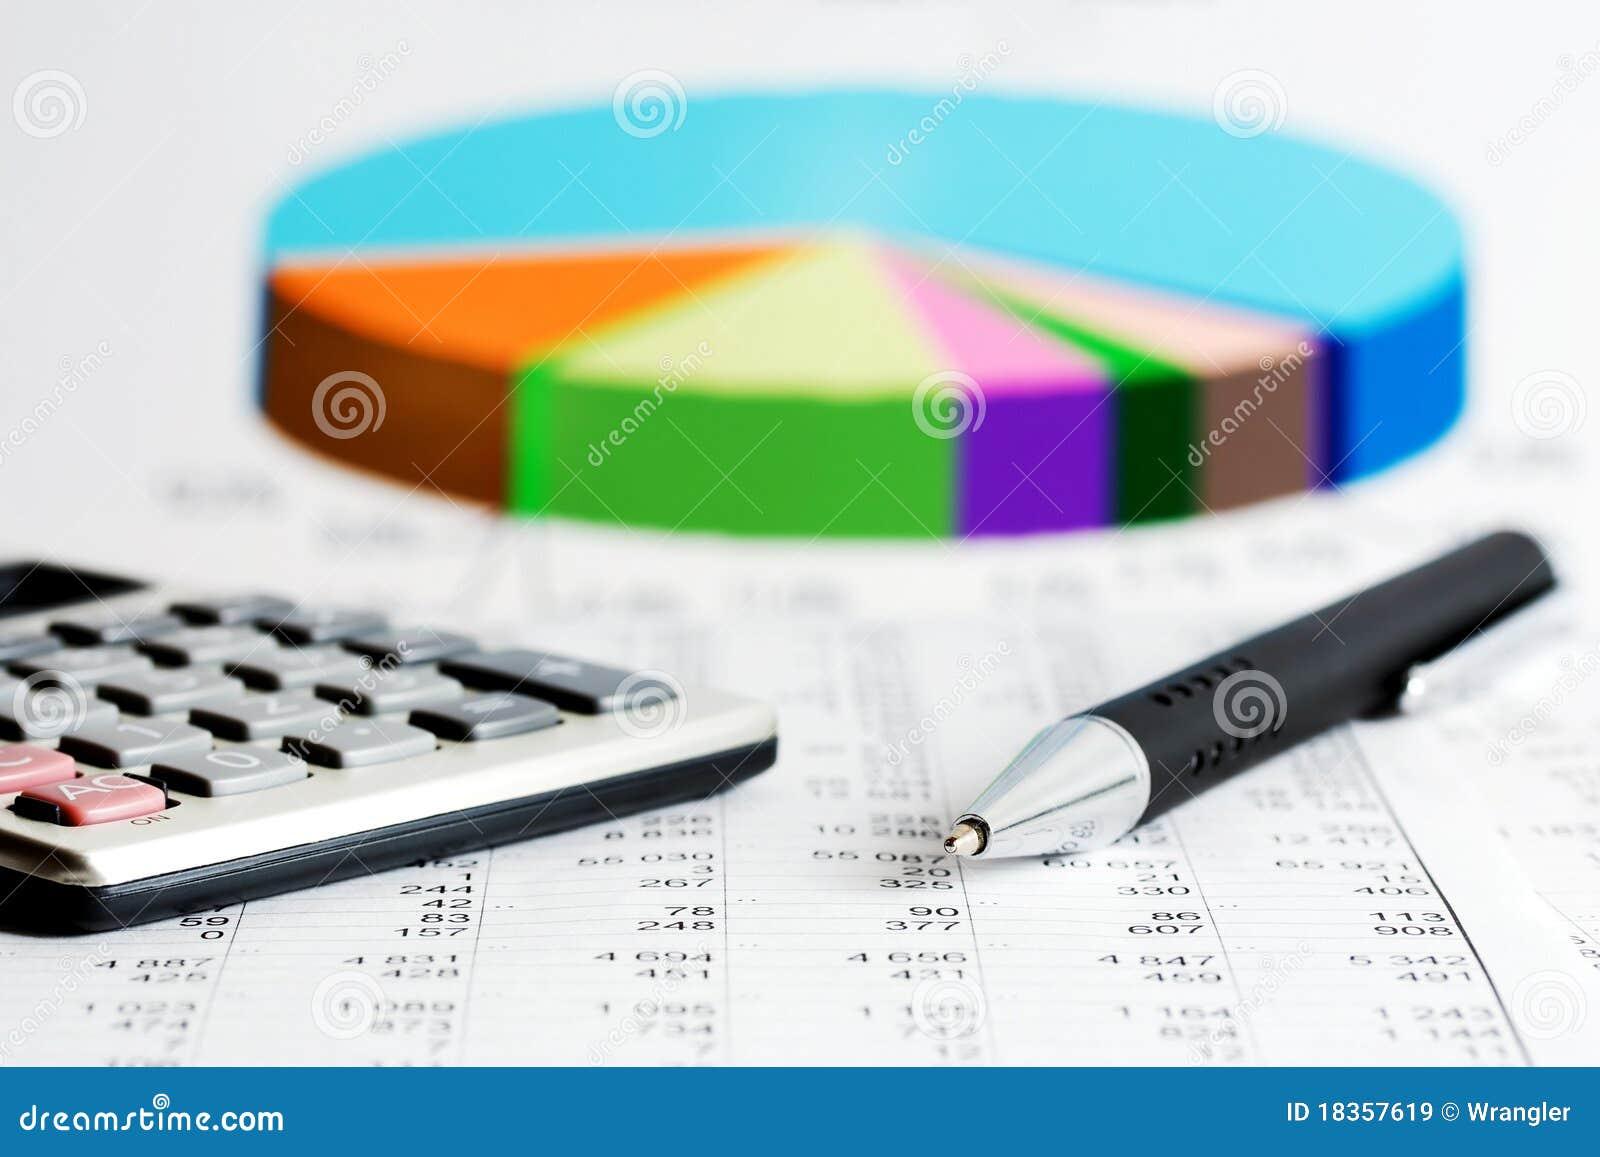 Analysis financial